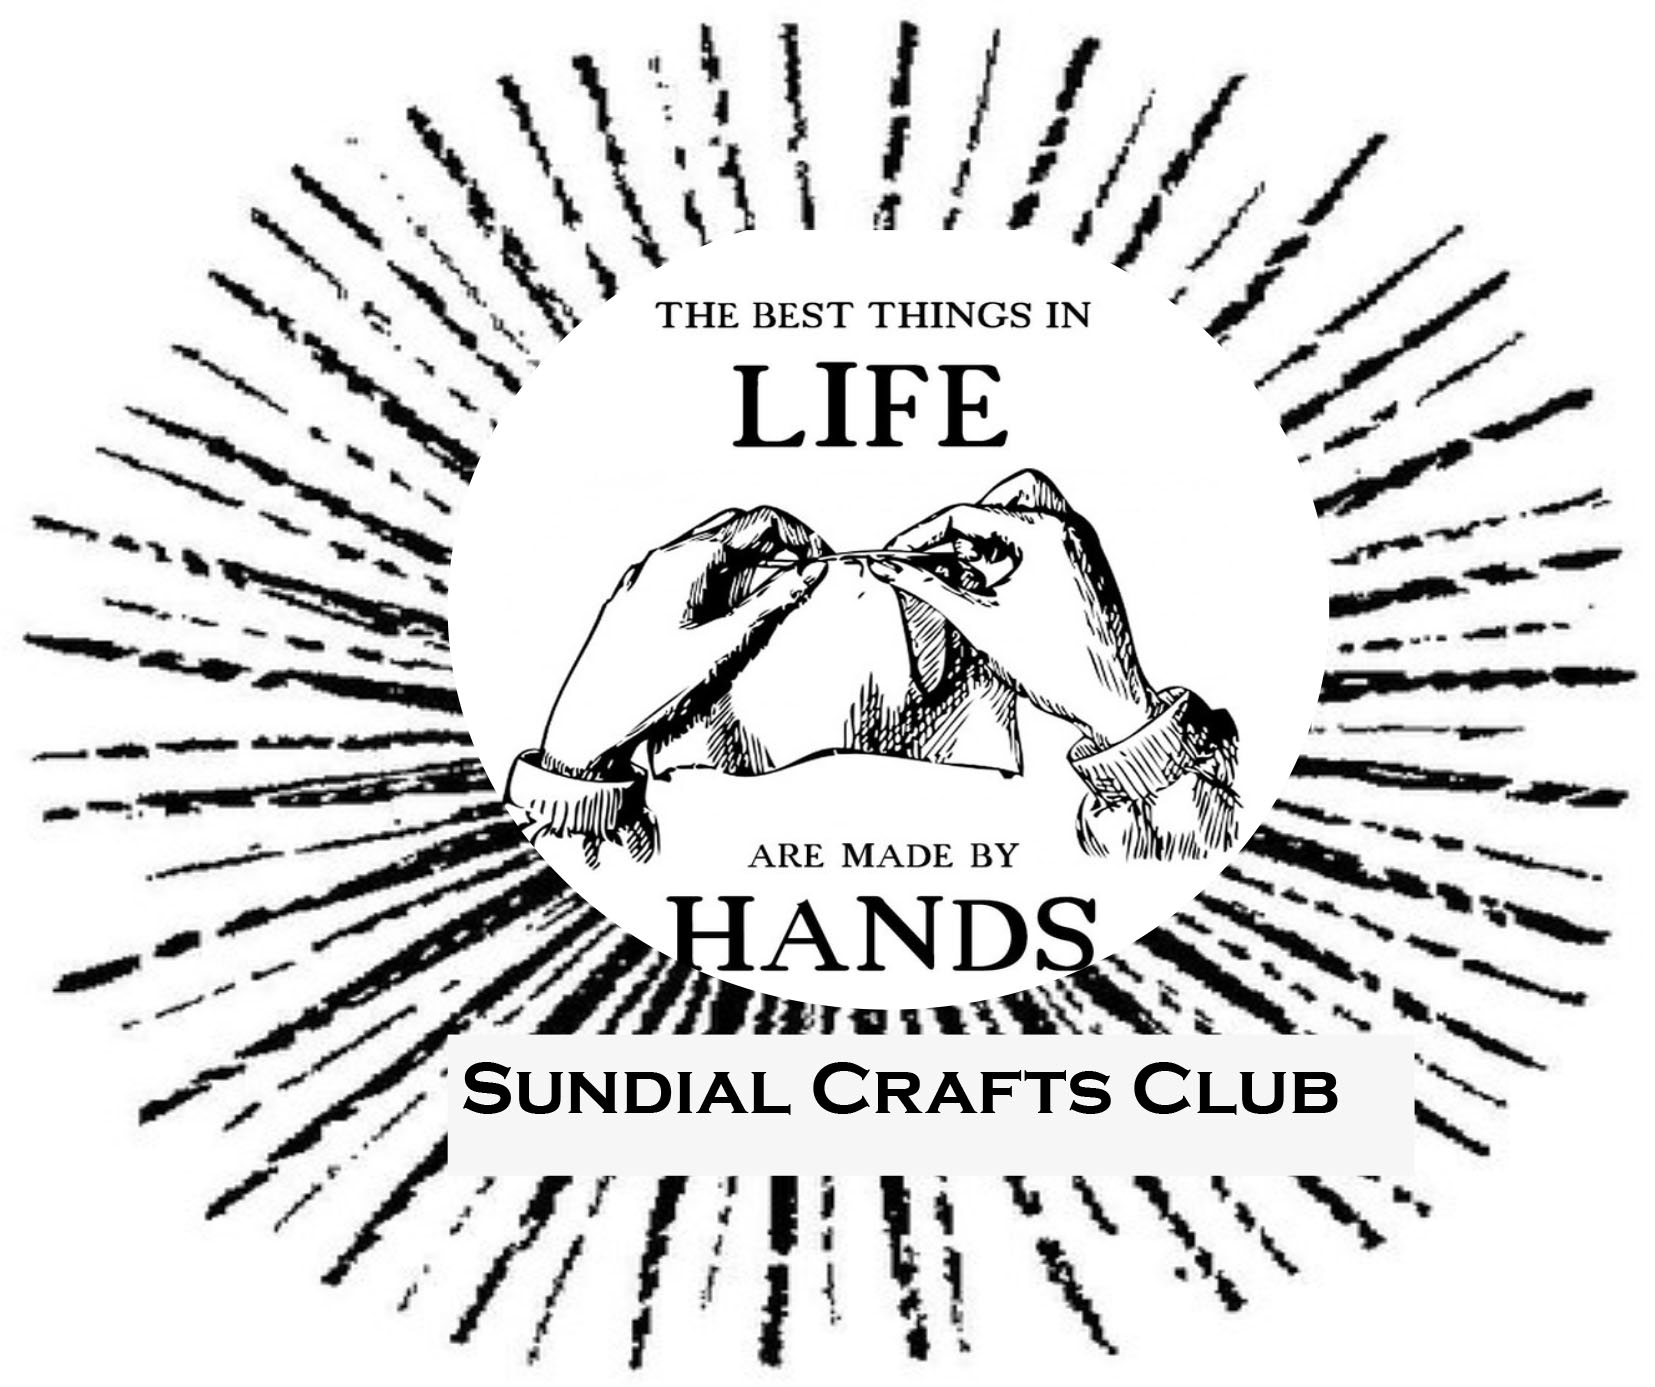 Crafts Club Of Sundial Center